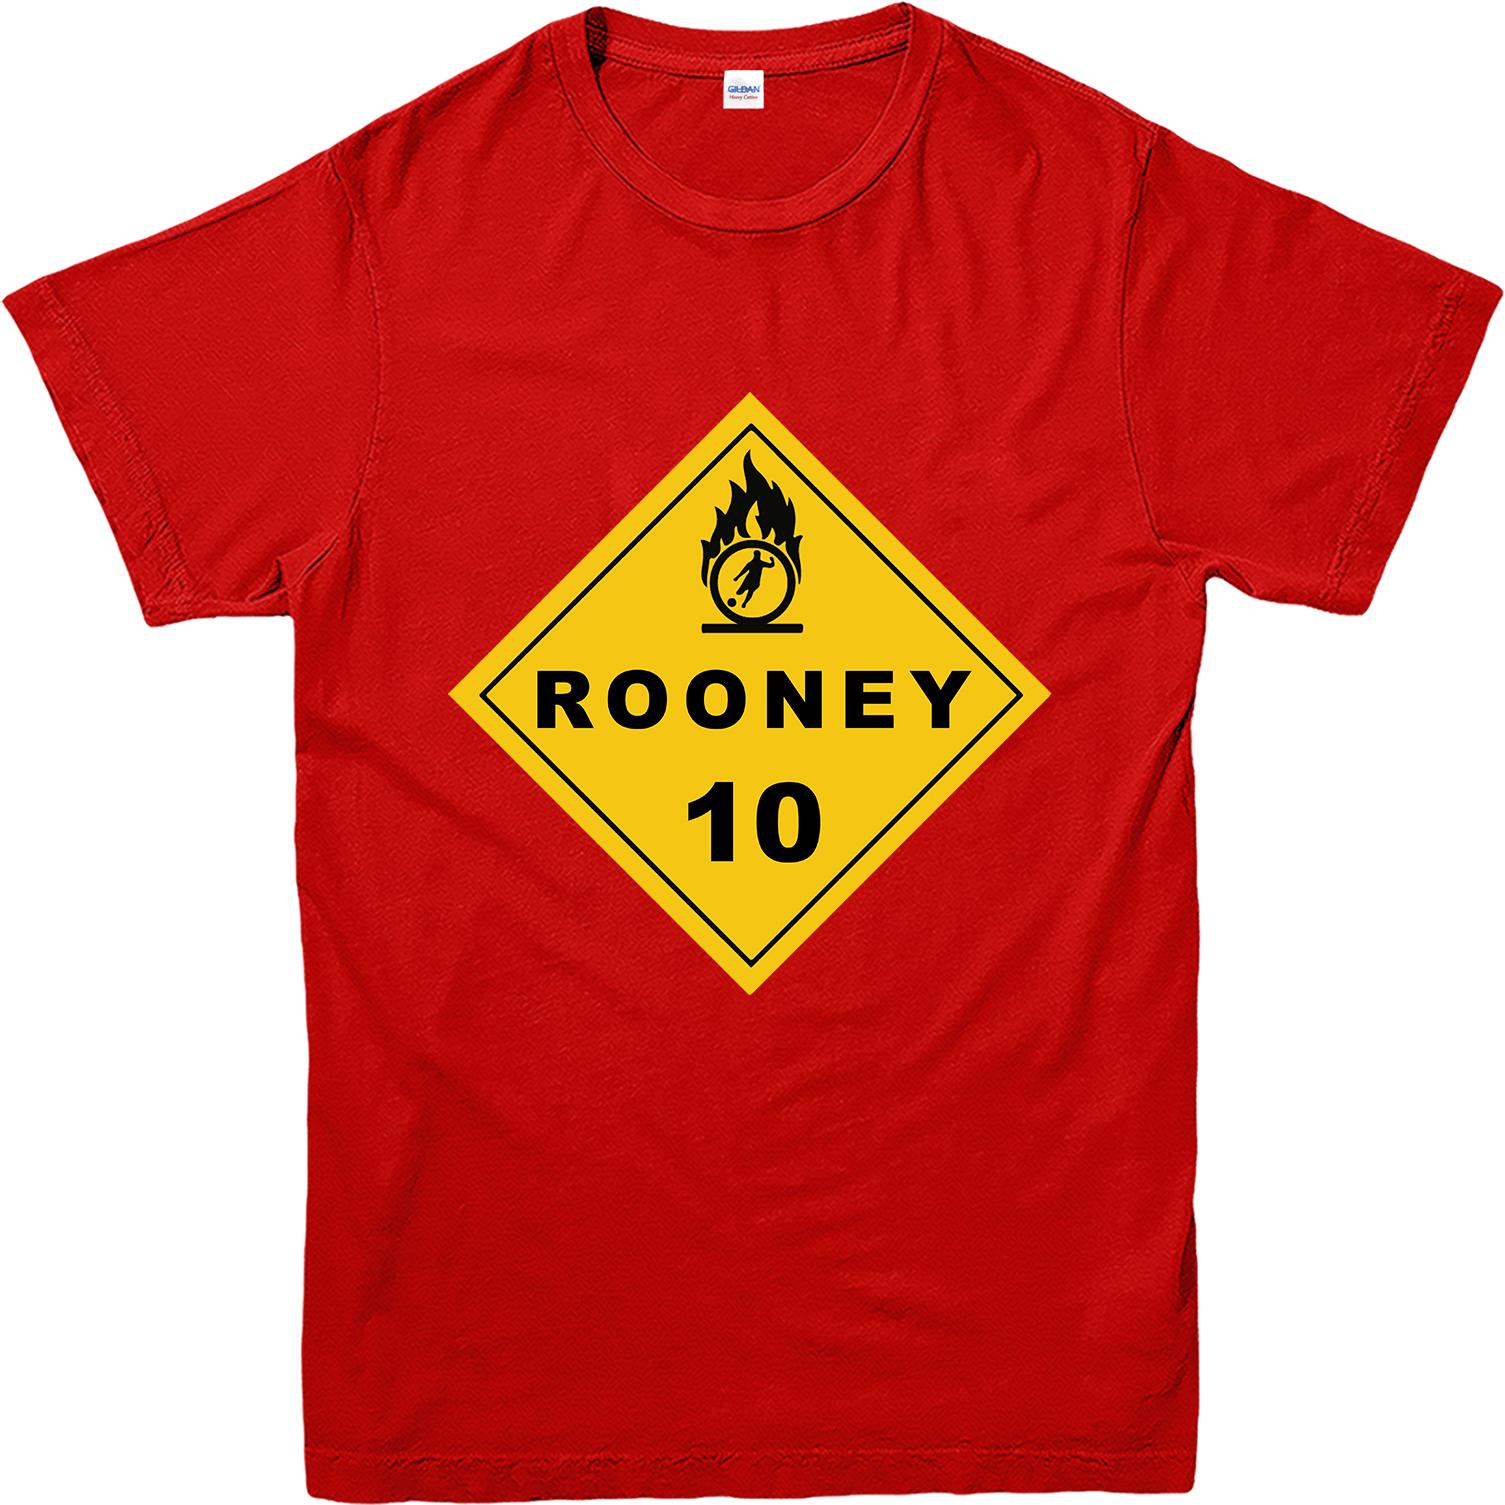 Design t shirt manchester united - Rooney T Shirt Man United Wayne Rooney Design